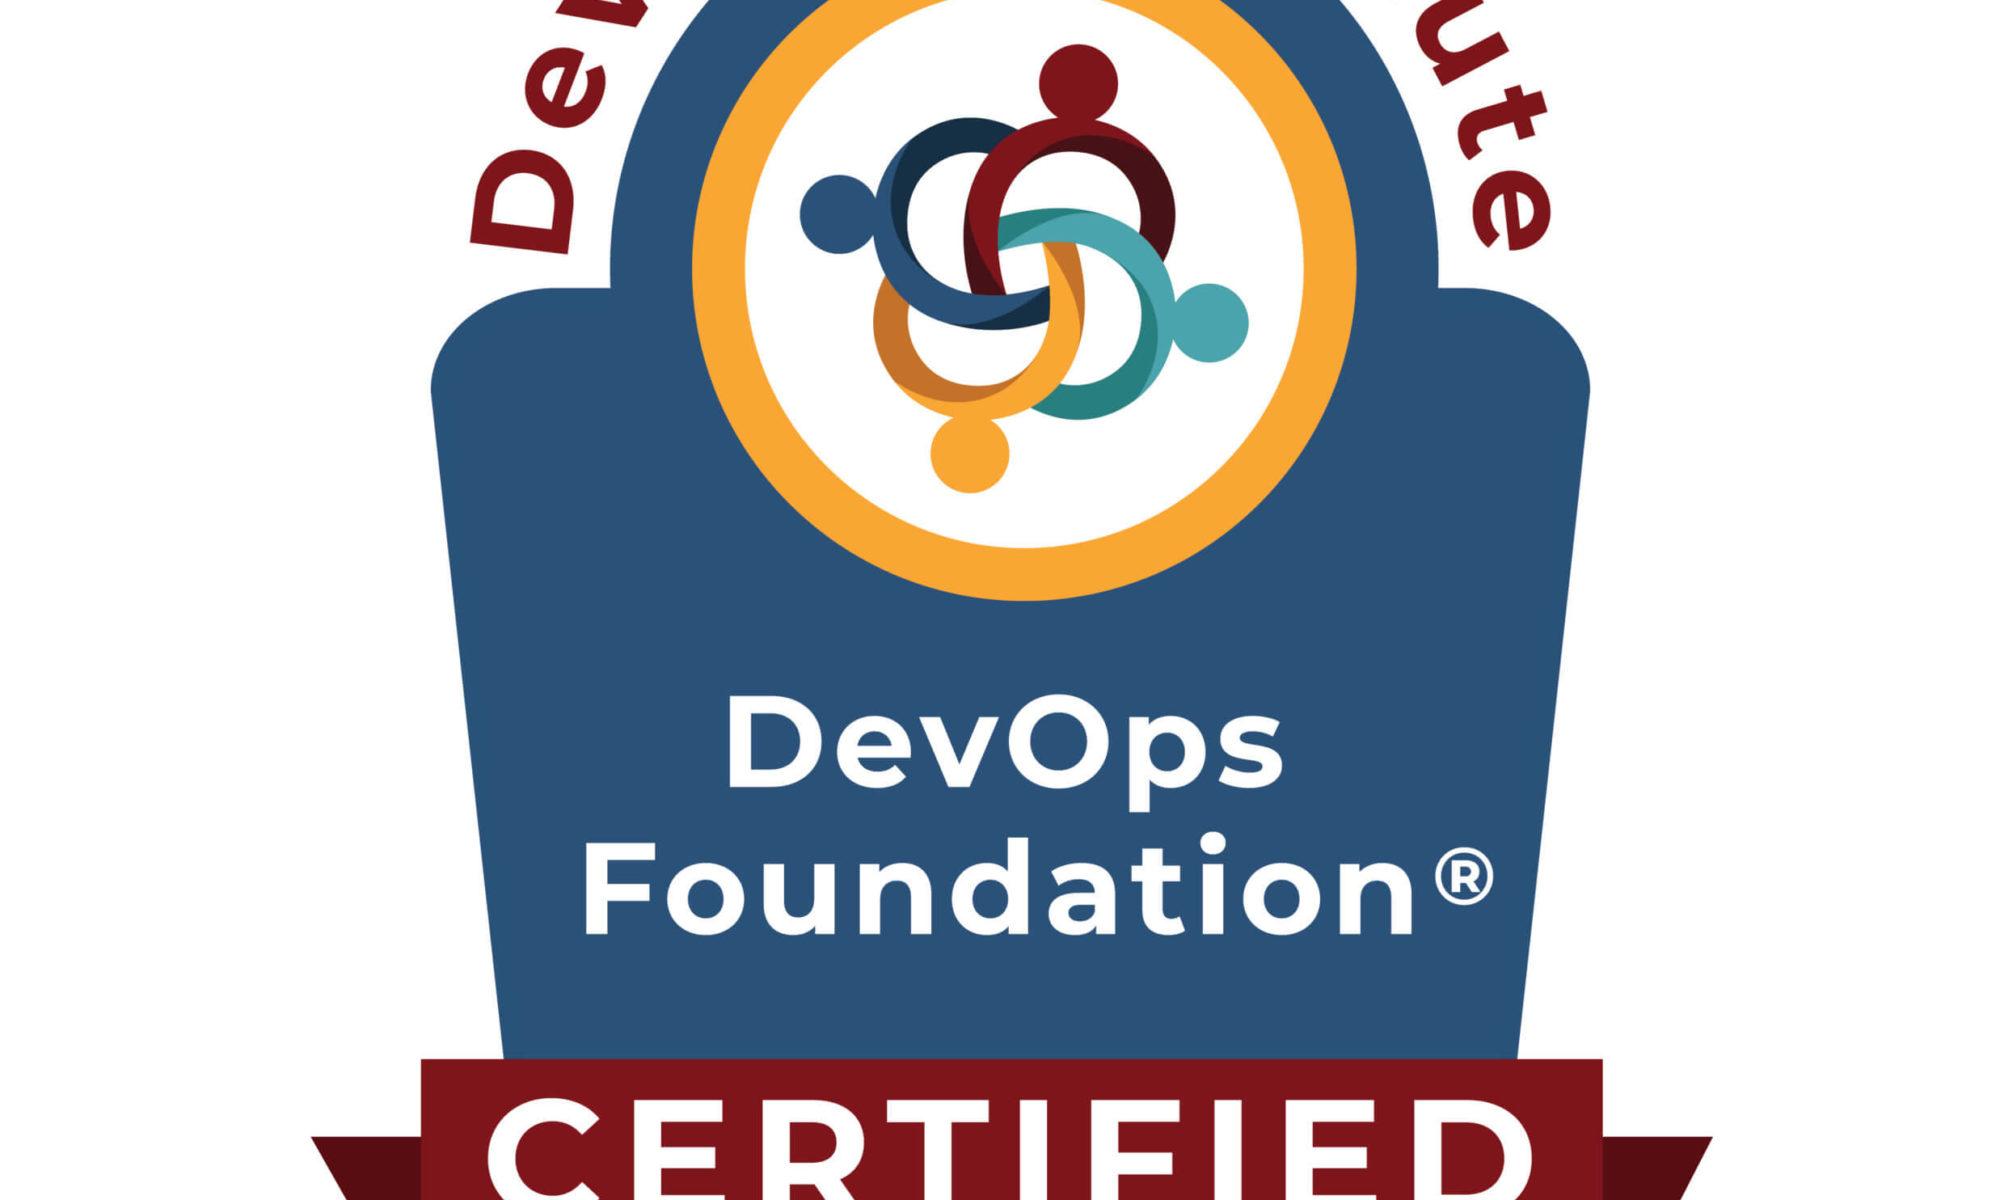 DevOps Foundation DOI